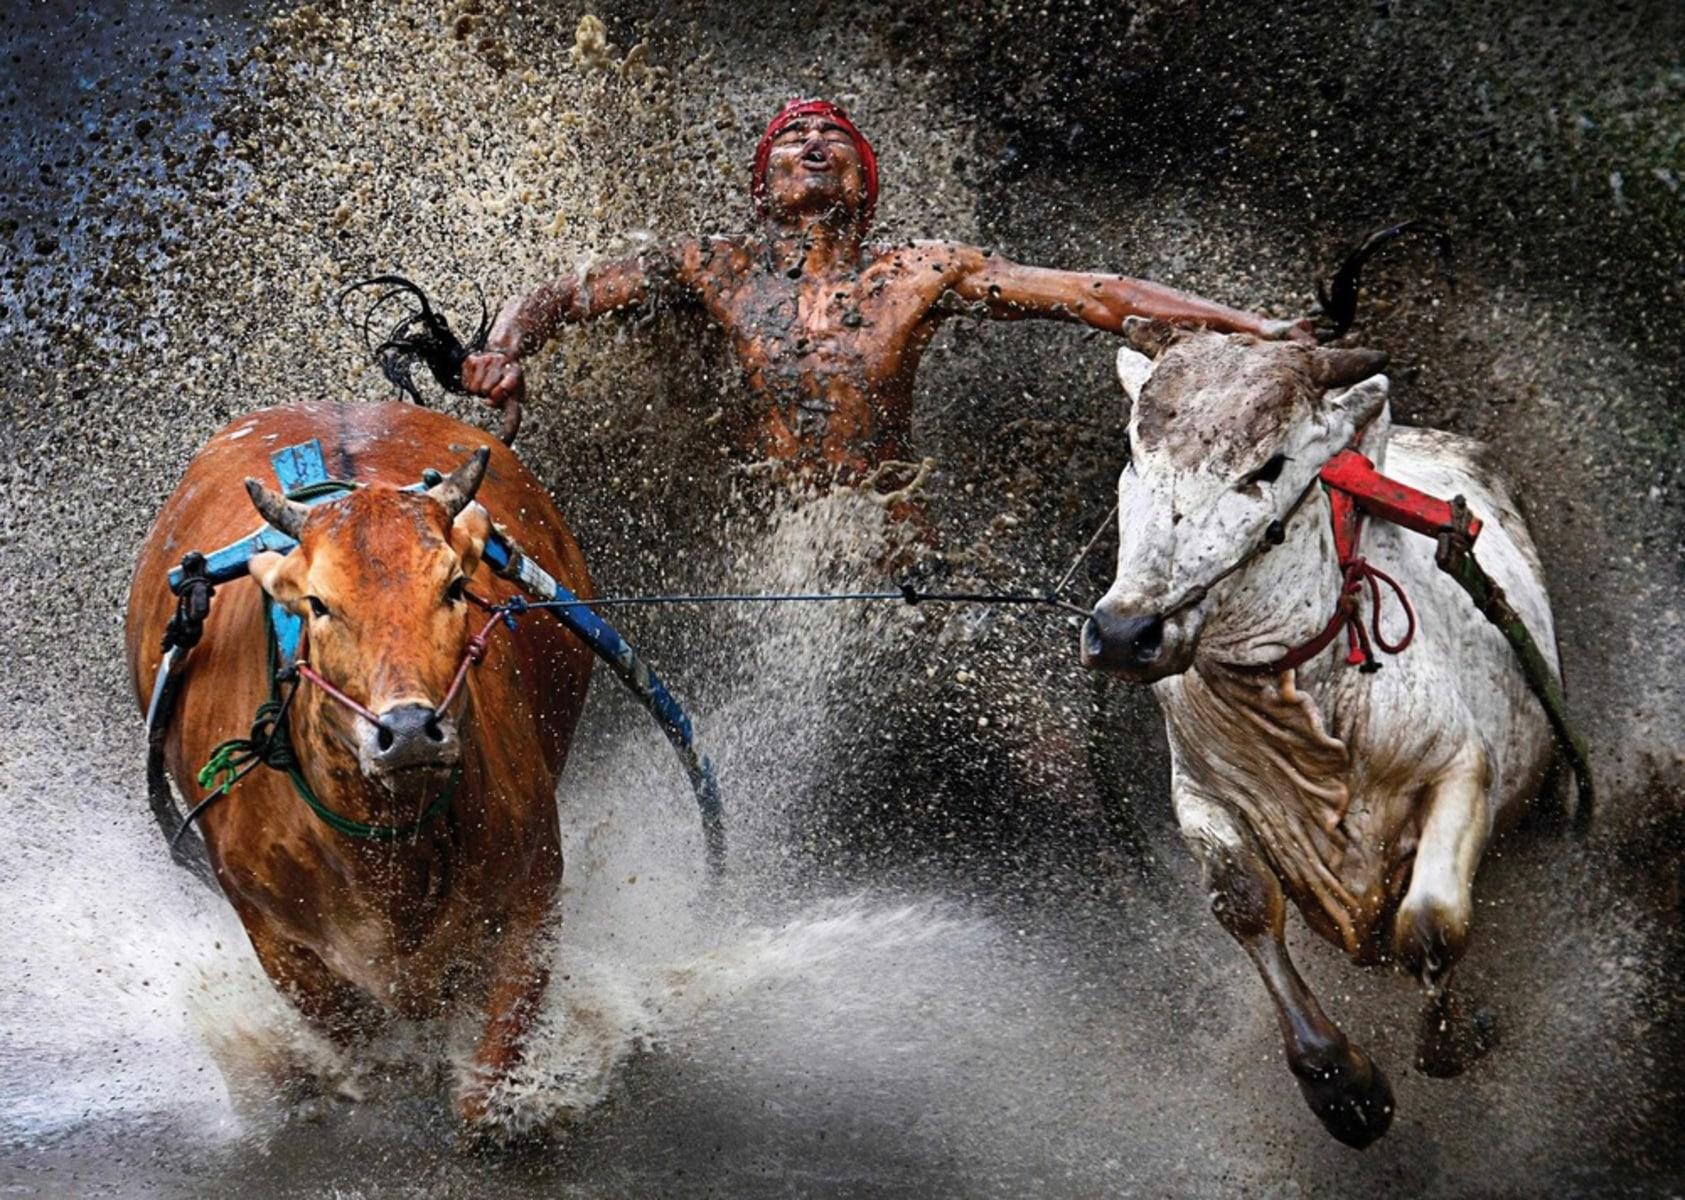 Image: World Press Photo 2012 - 1st Prize Sports Action Single